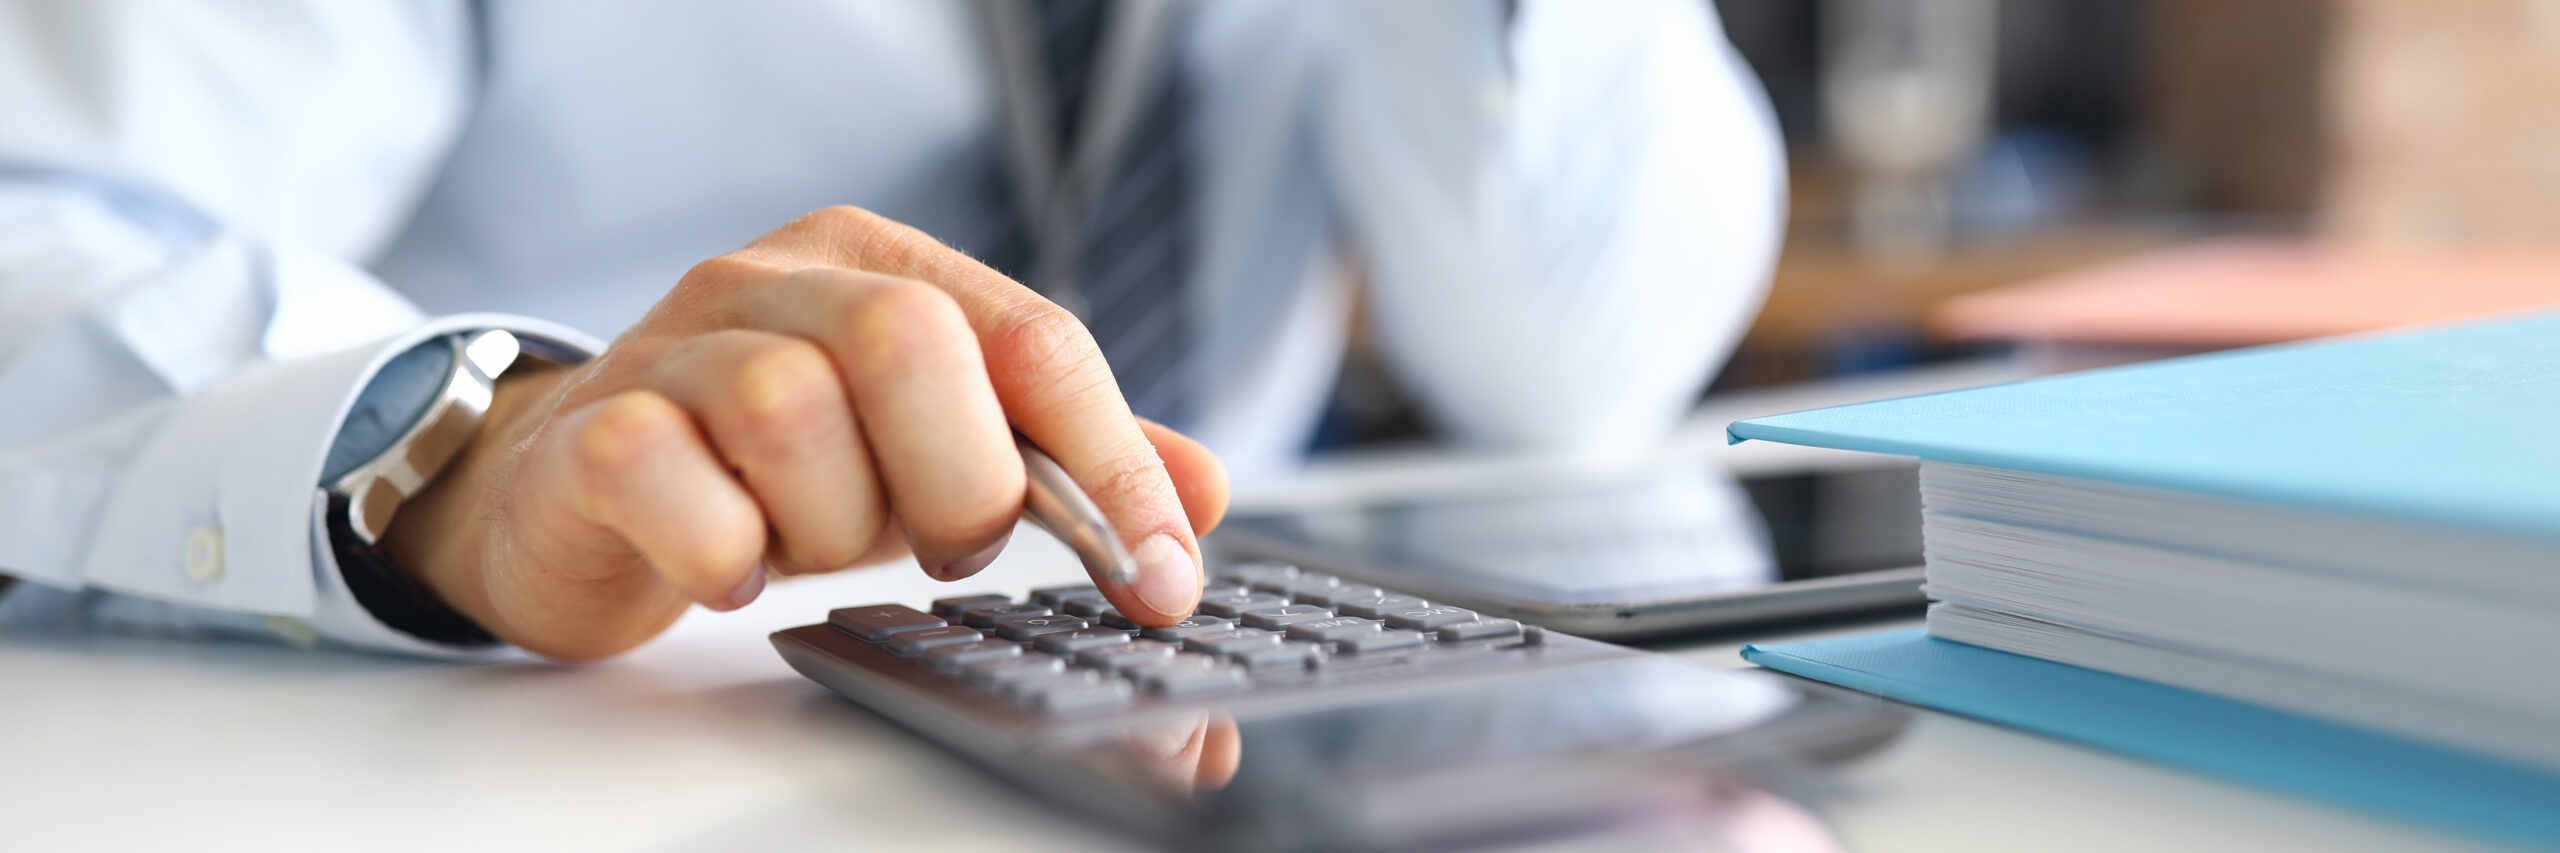 Neues Lehrgangsangebot: IHK Zertifikatslehrgang Lohn und Gehalt